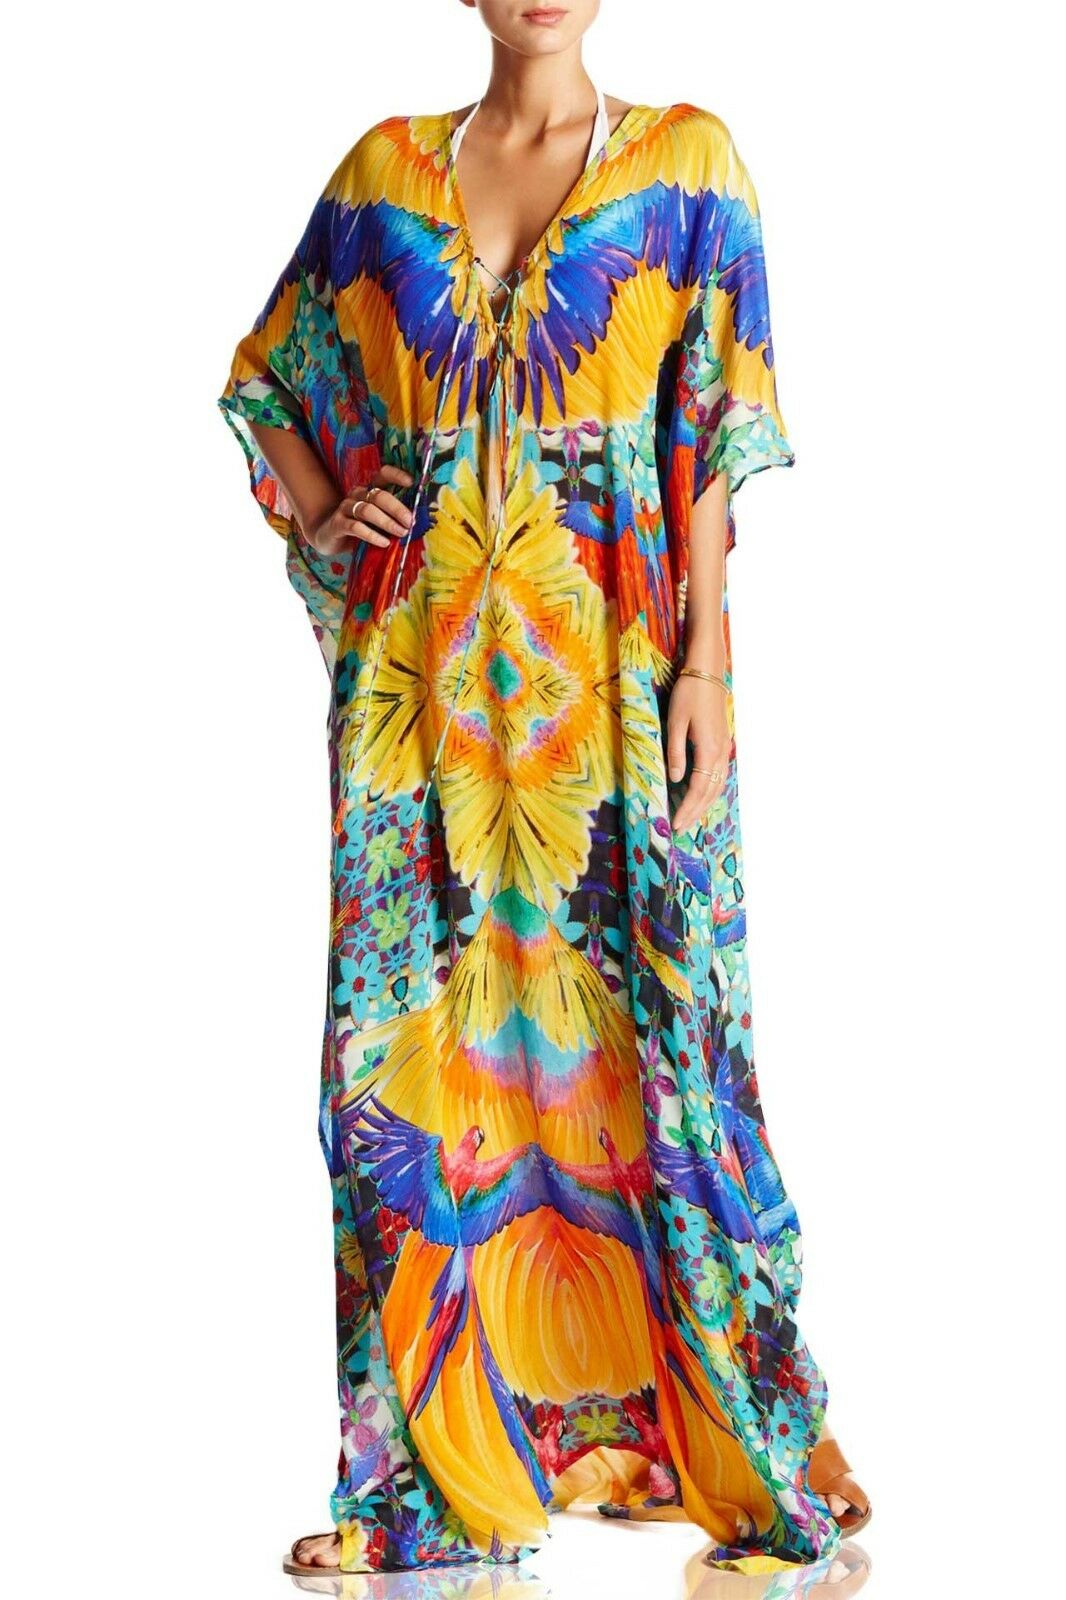 NEW SHAHIDA PARIDES TROPICAL PRINT LUXURY LONG LACE-UP KAFTAN DRESS SIZE OS WOW